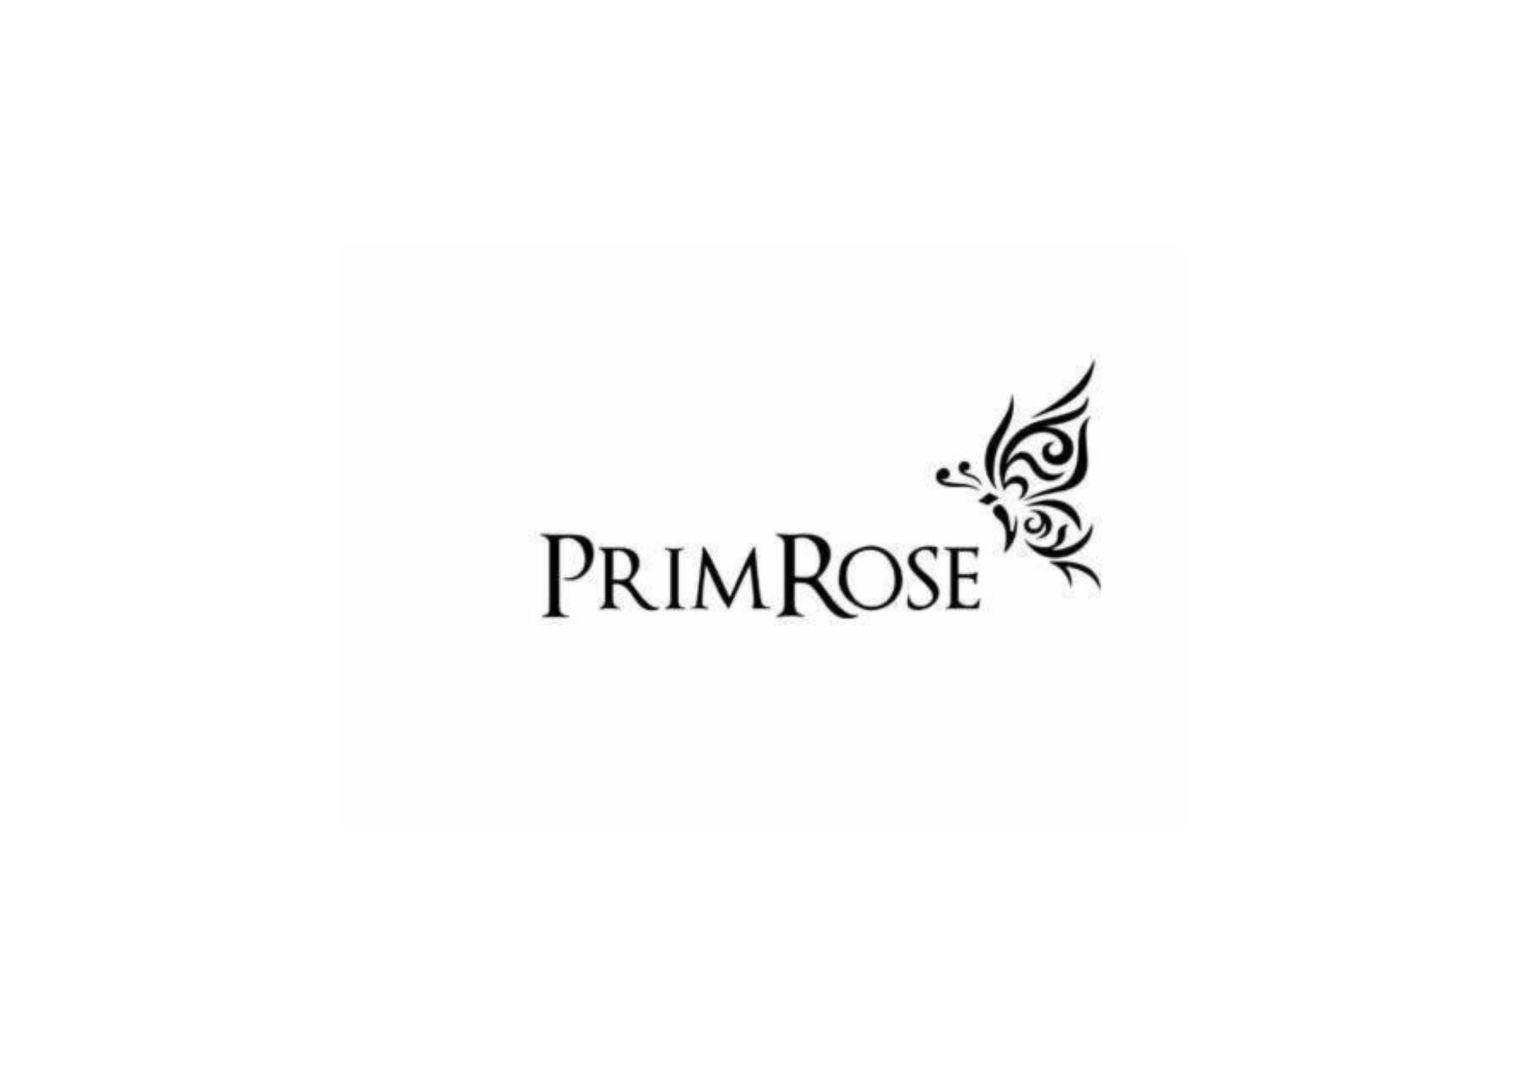 PrimRose スタッフ募集!イオンモール石巻店 / TRFT11001のカバー写真